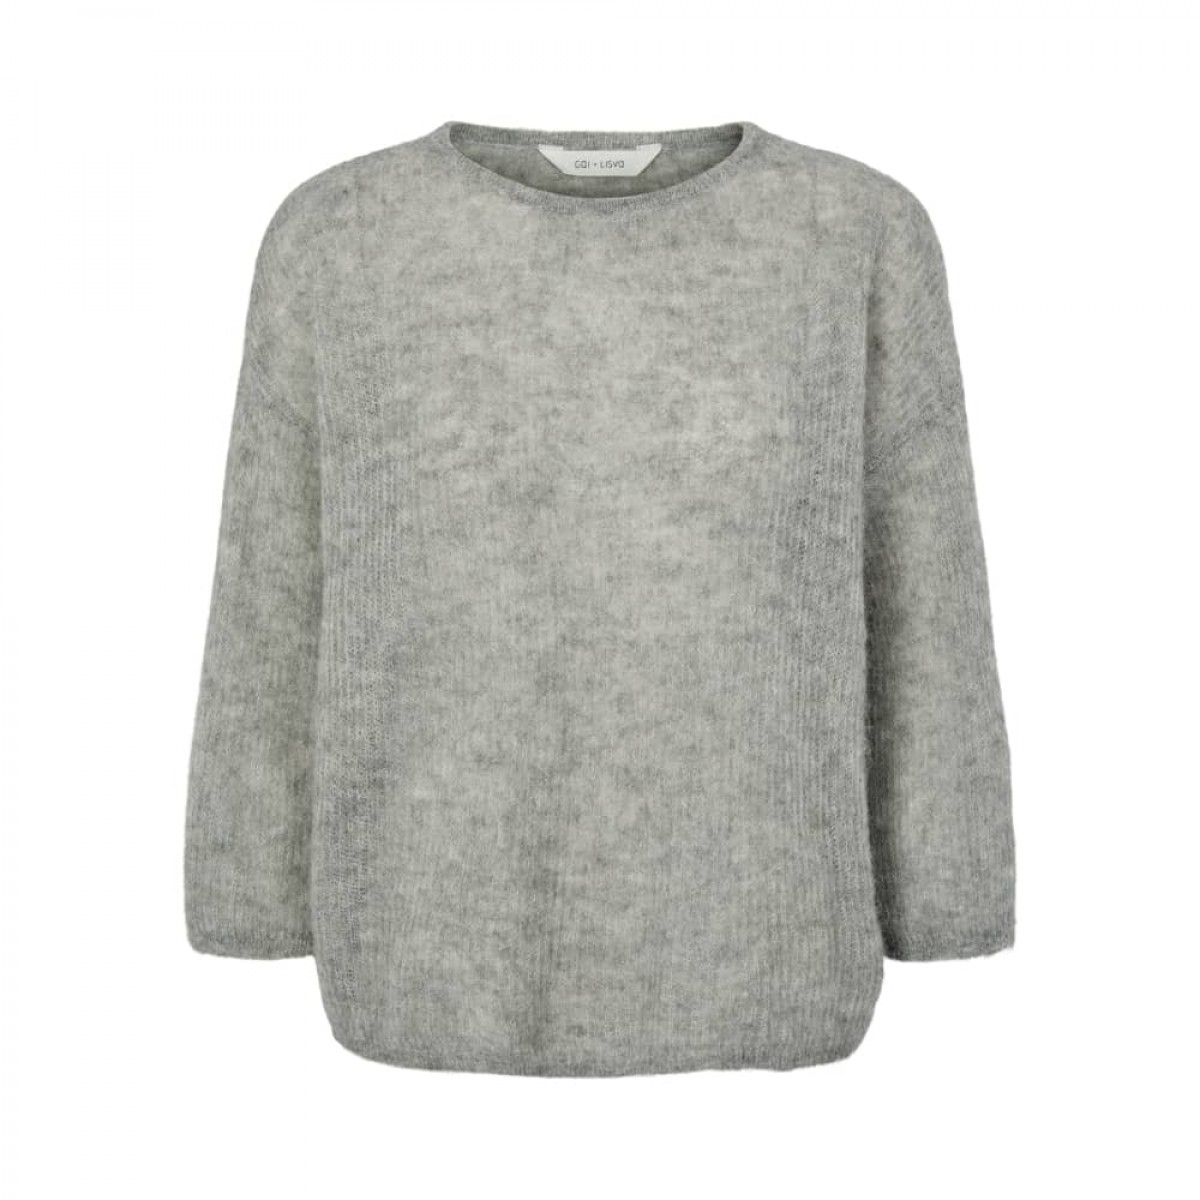 edda strik bluse - grey melange